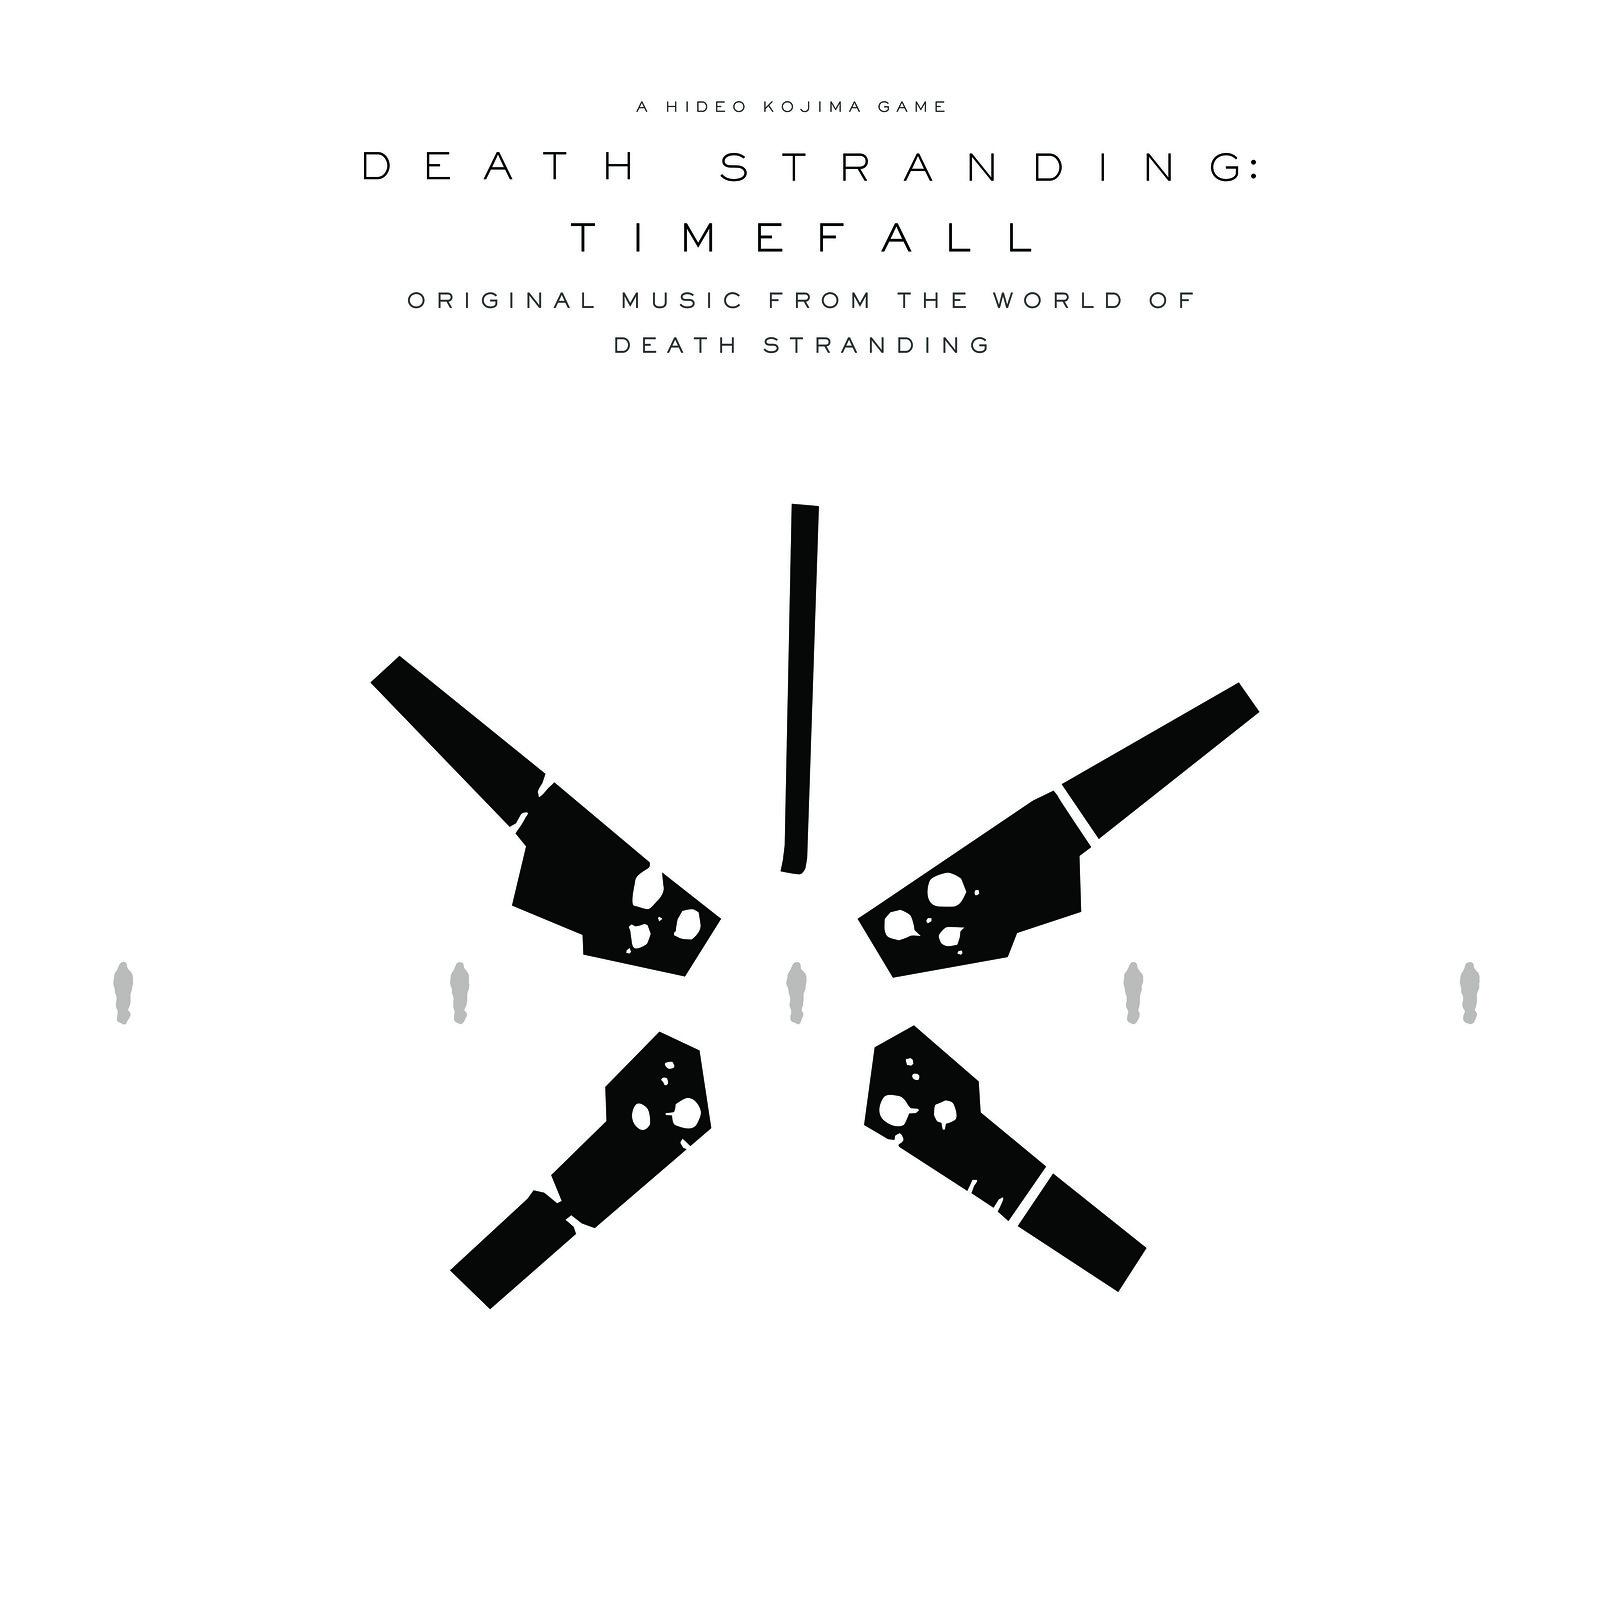 Pochette de l'album Death Stranding: Timefall